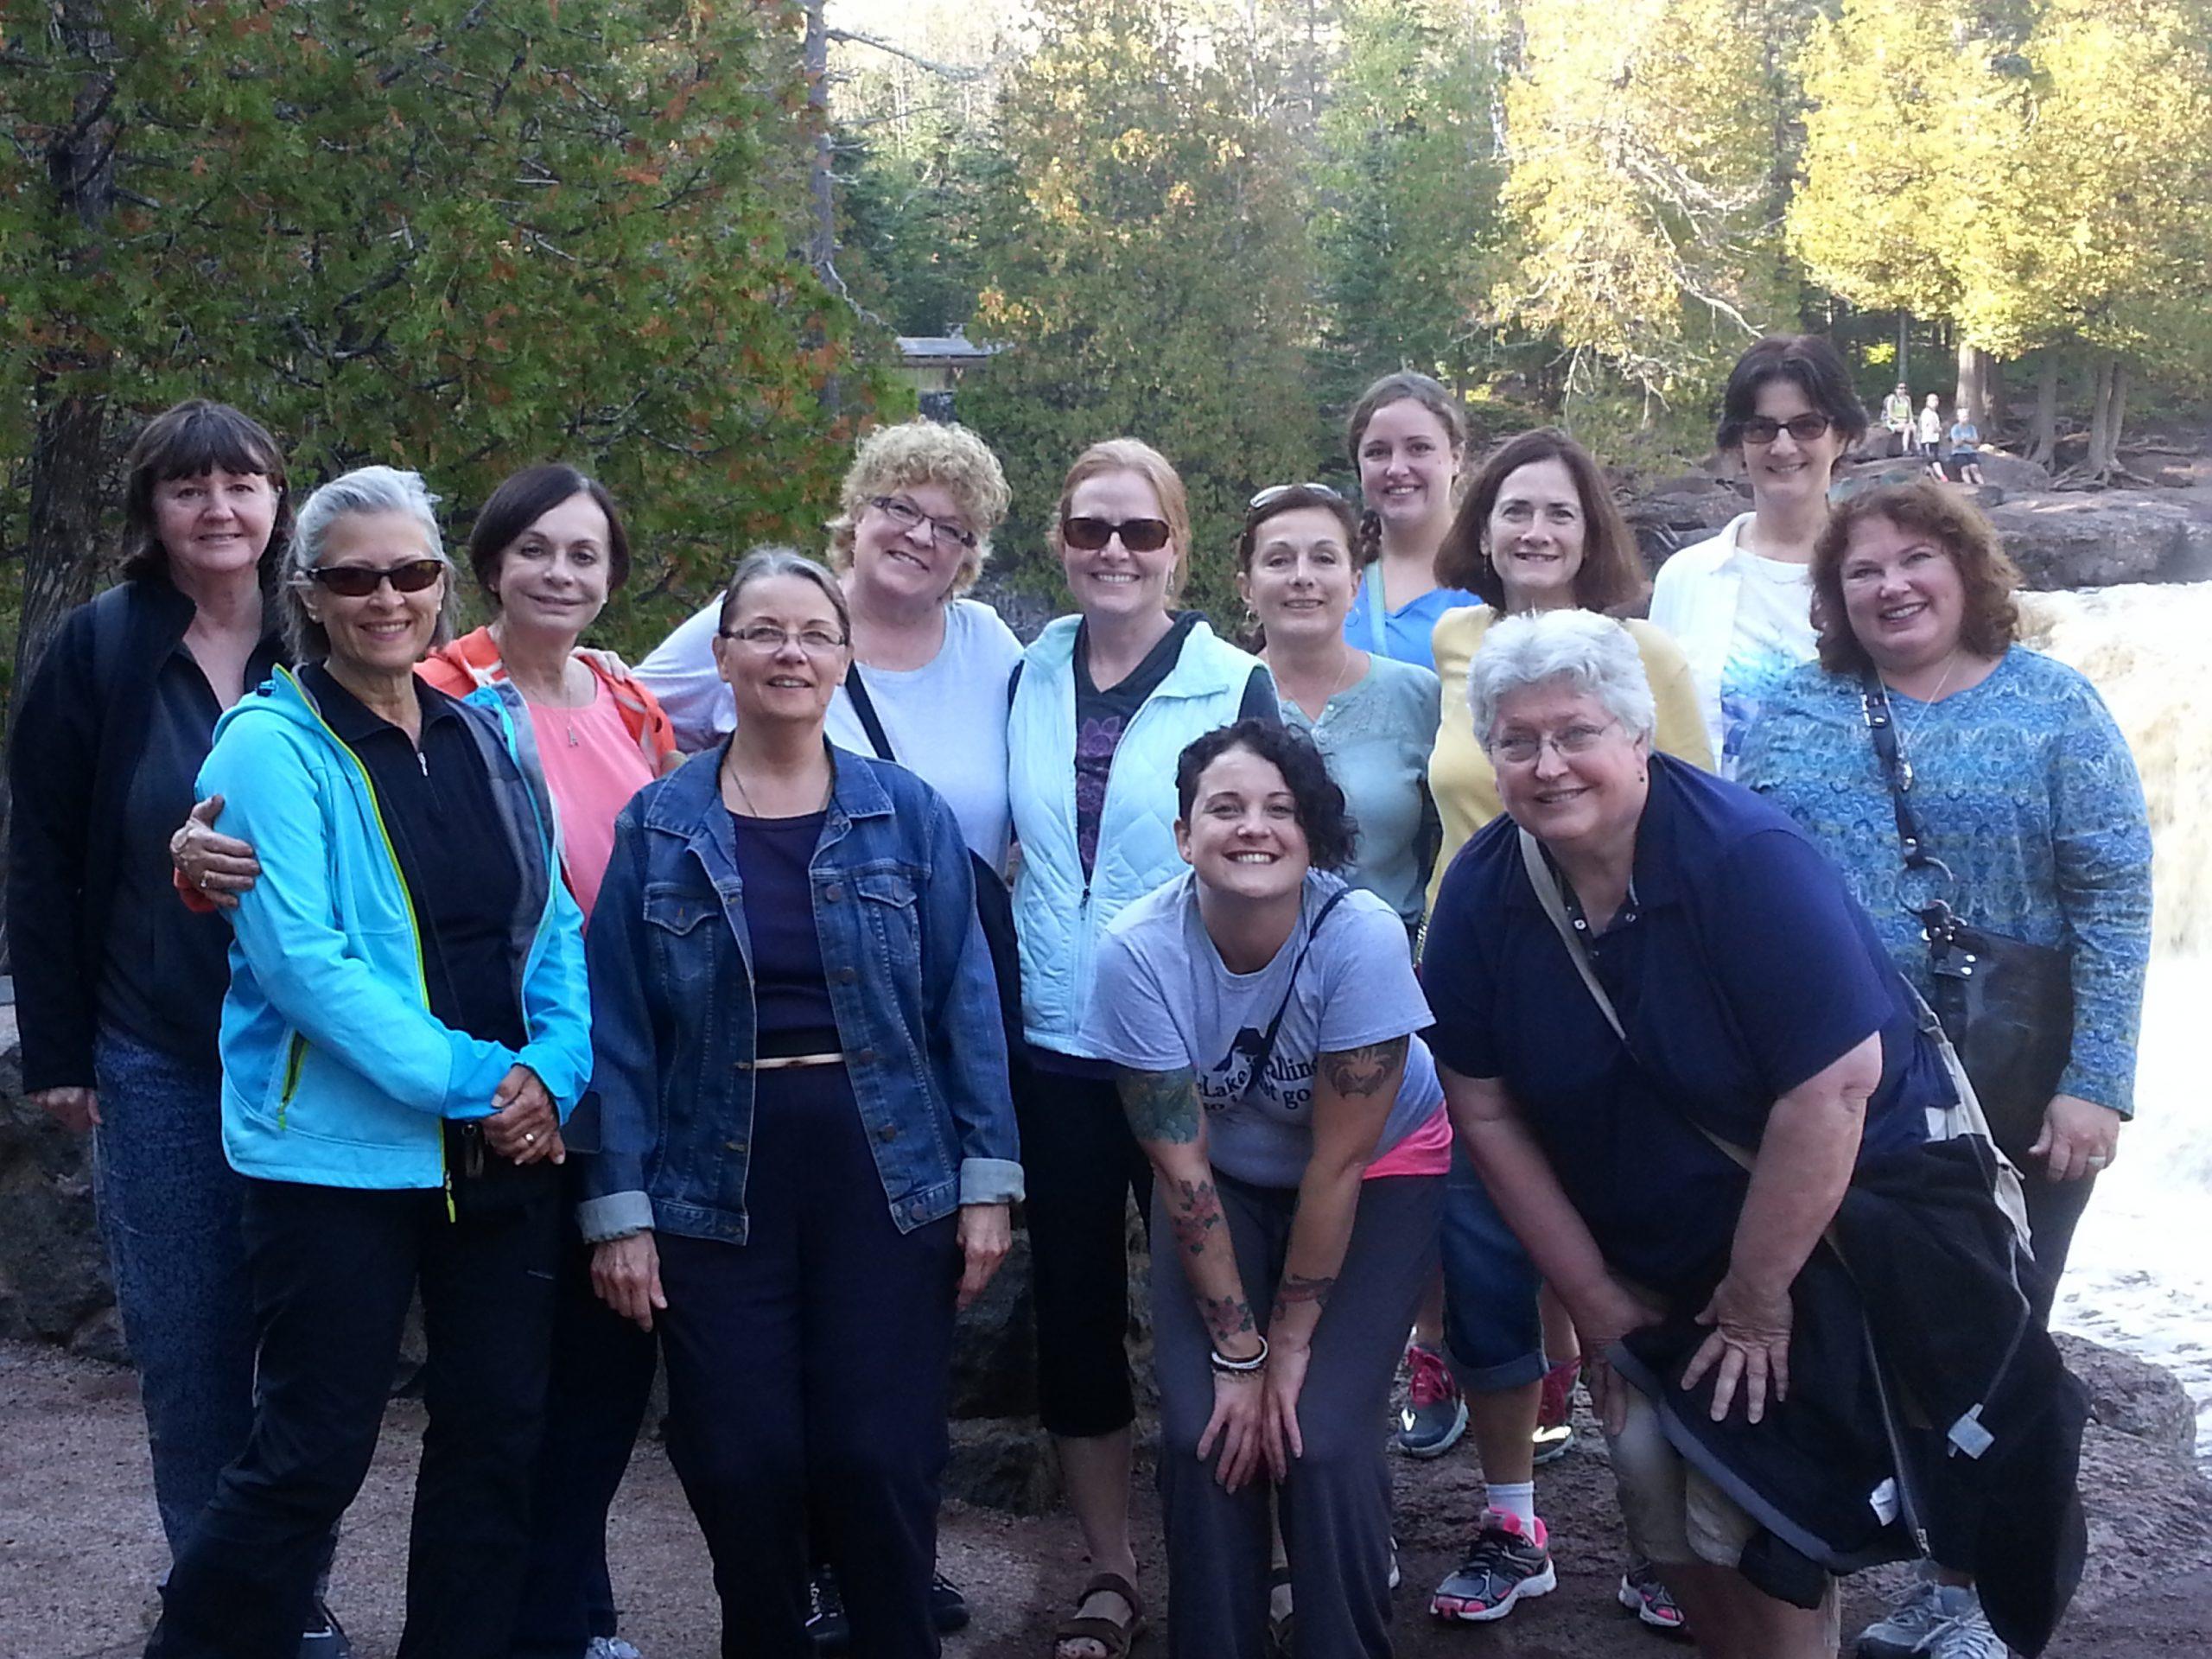 Group of women on retreat